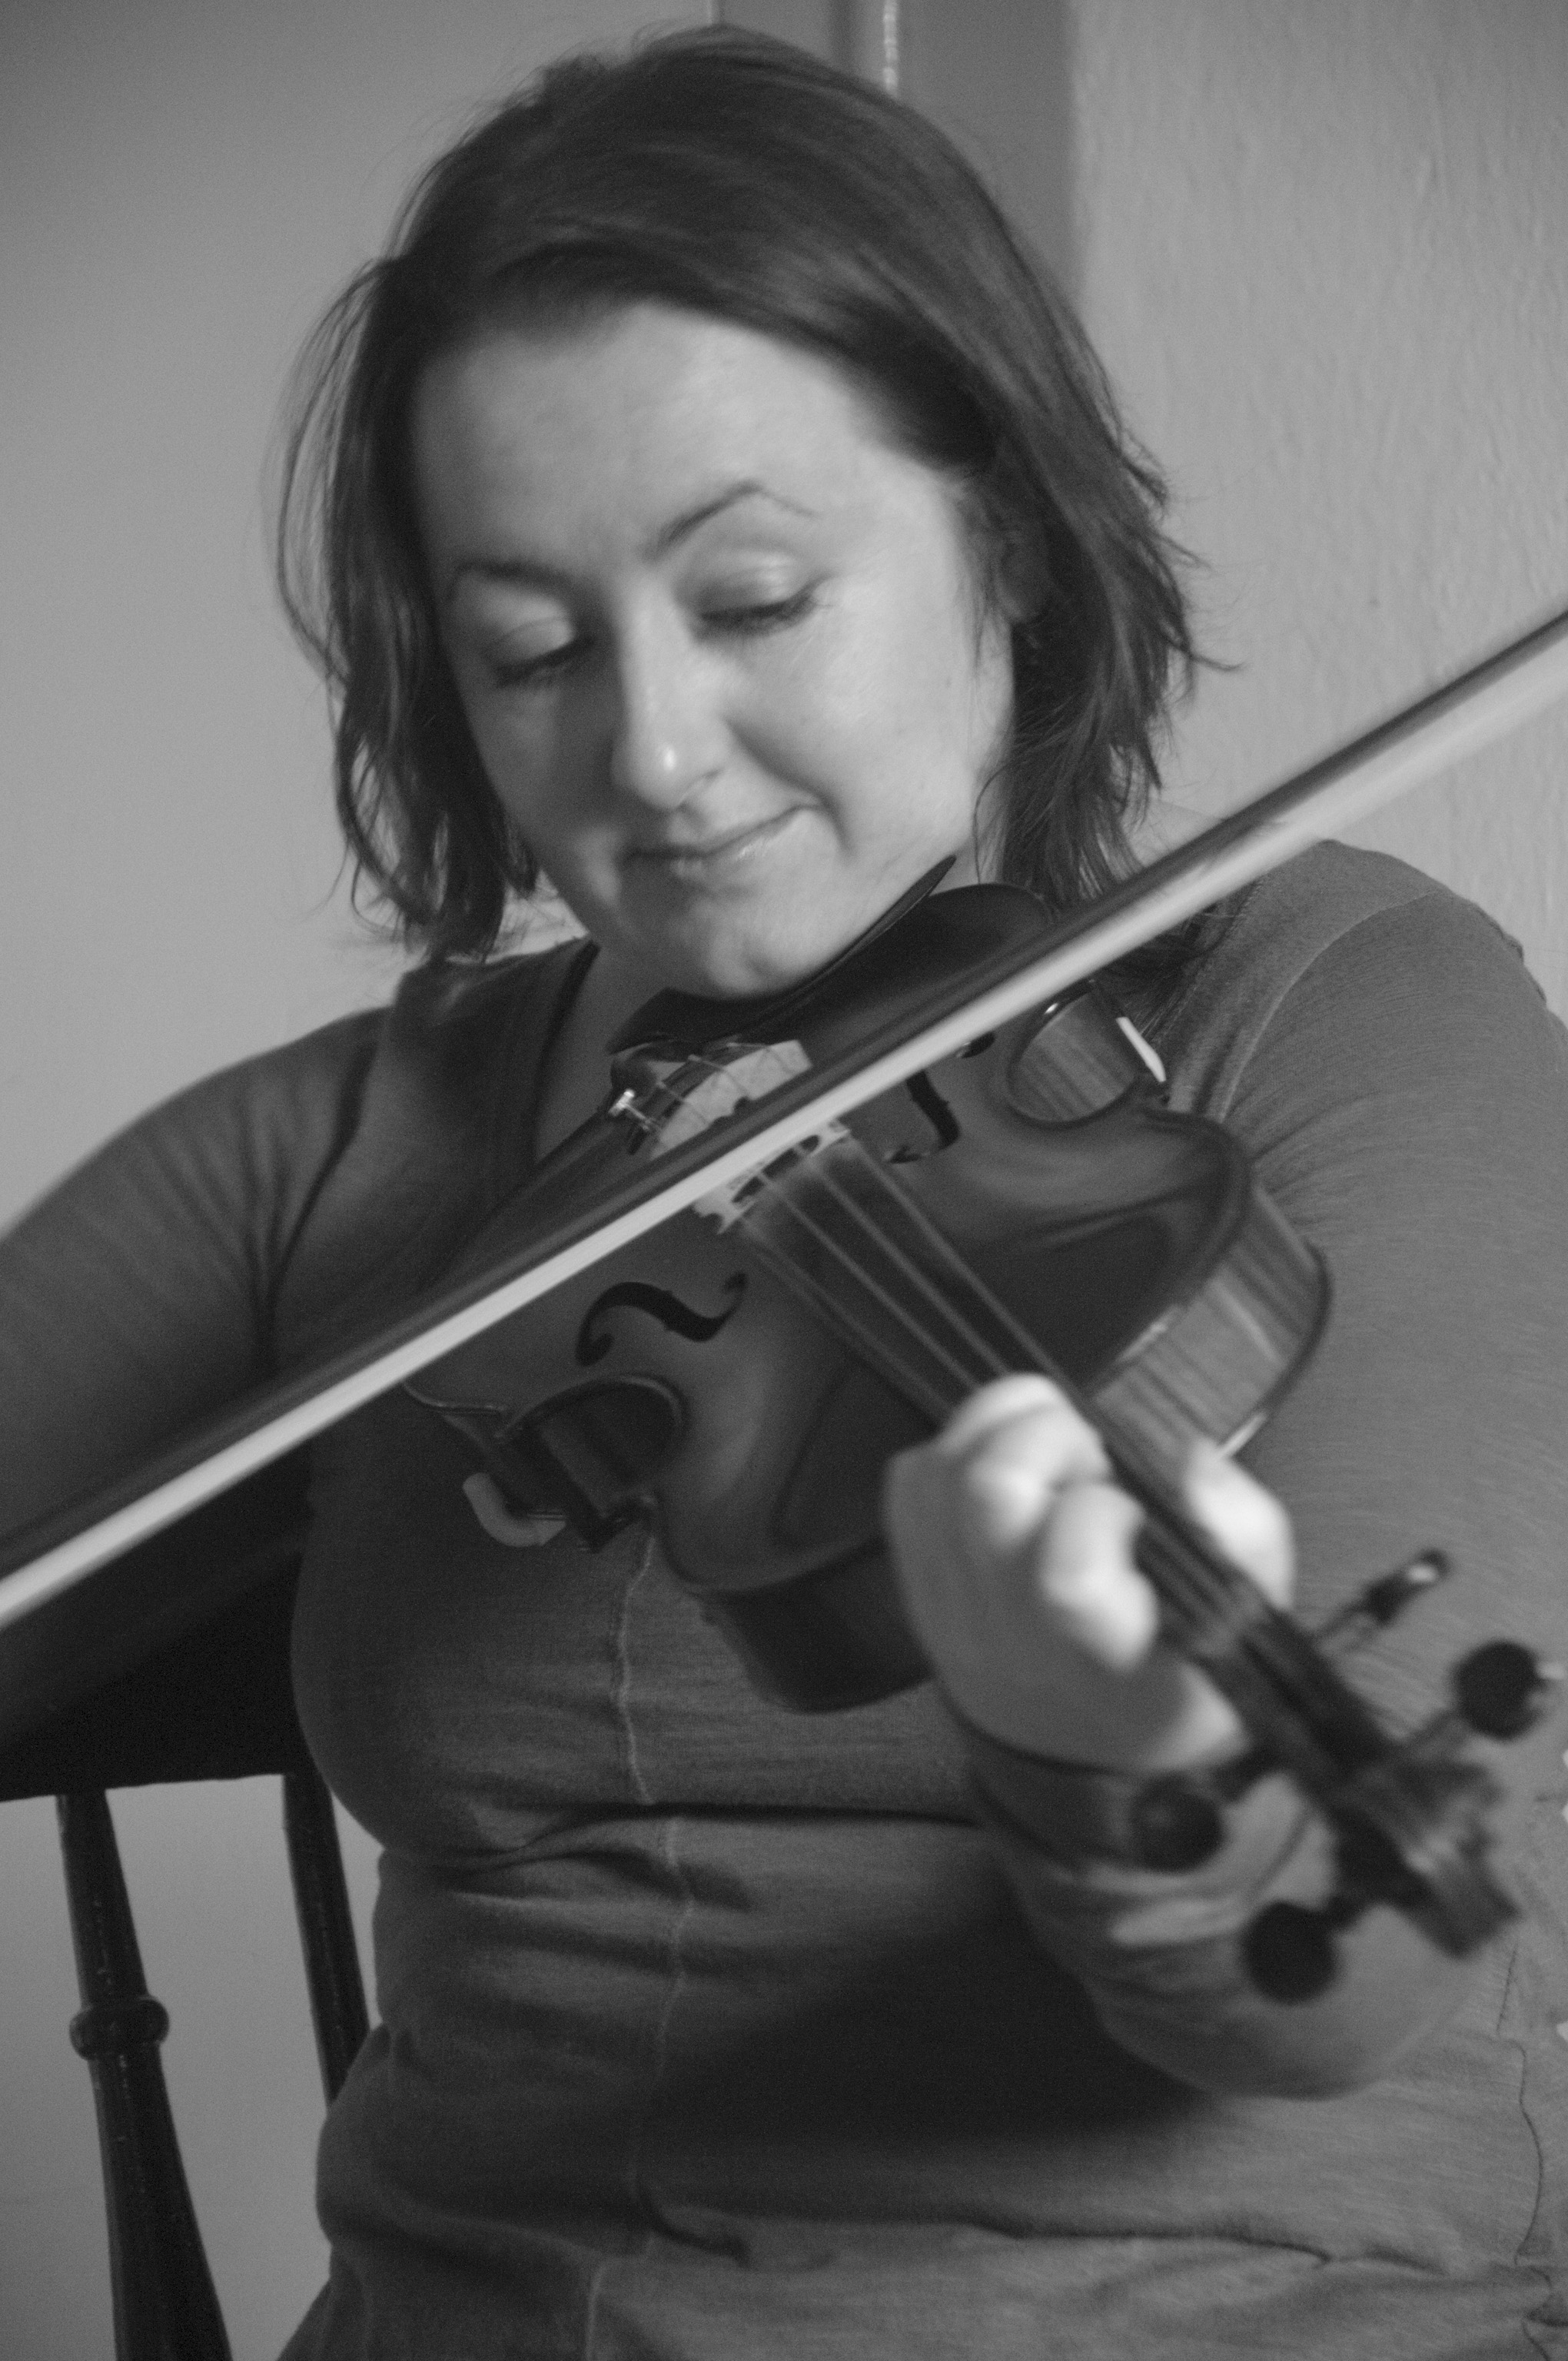 Tara Conaghan